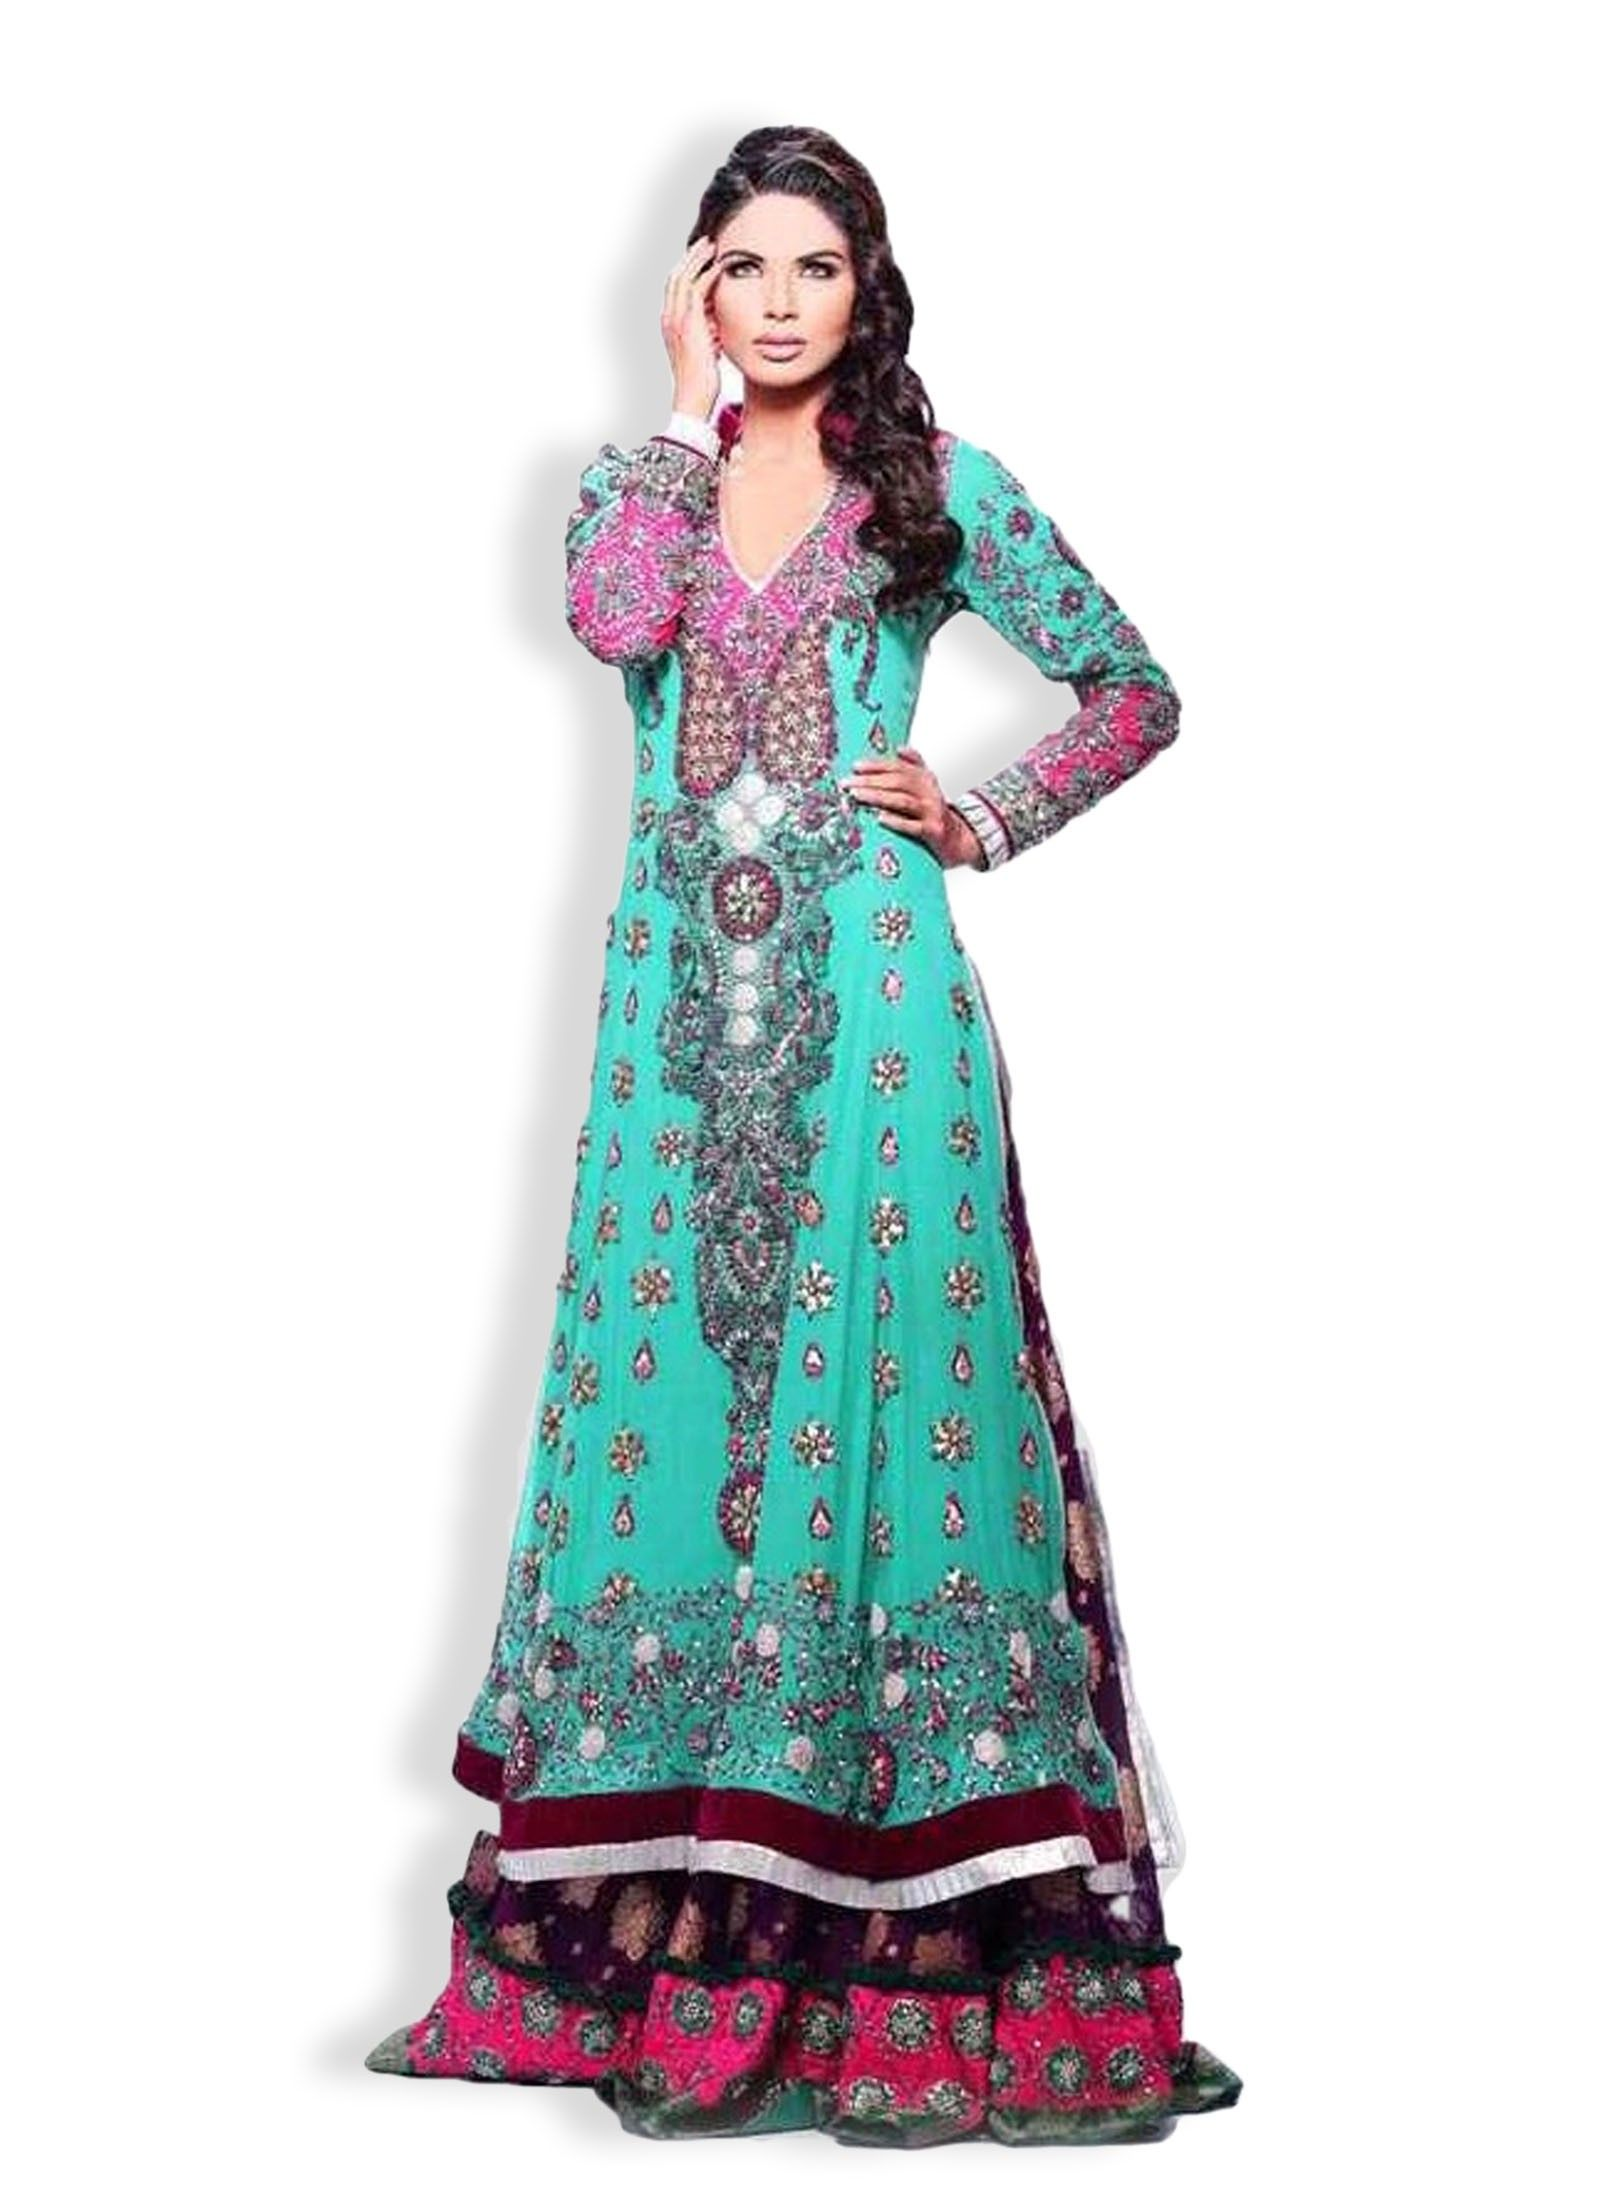 Shirt design girl pakistani - Latest Bridal Sharara Dress Design For Girls